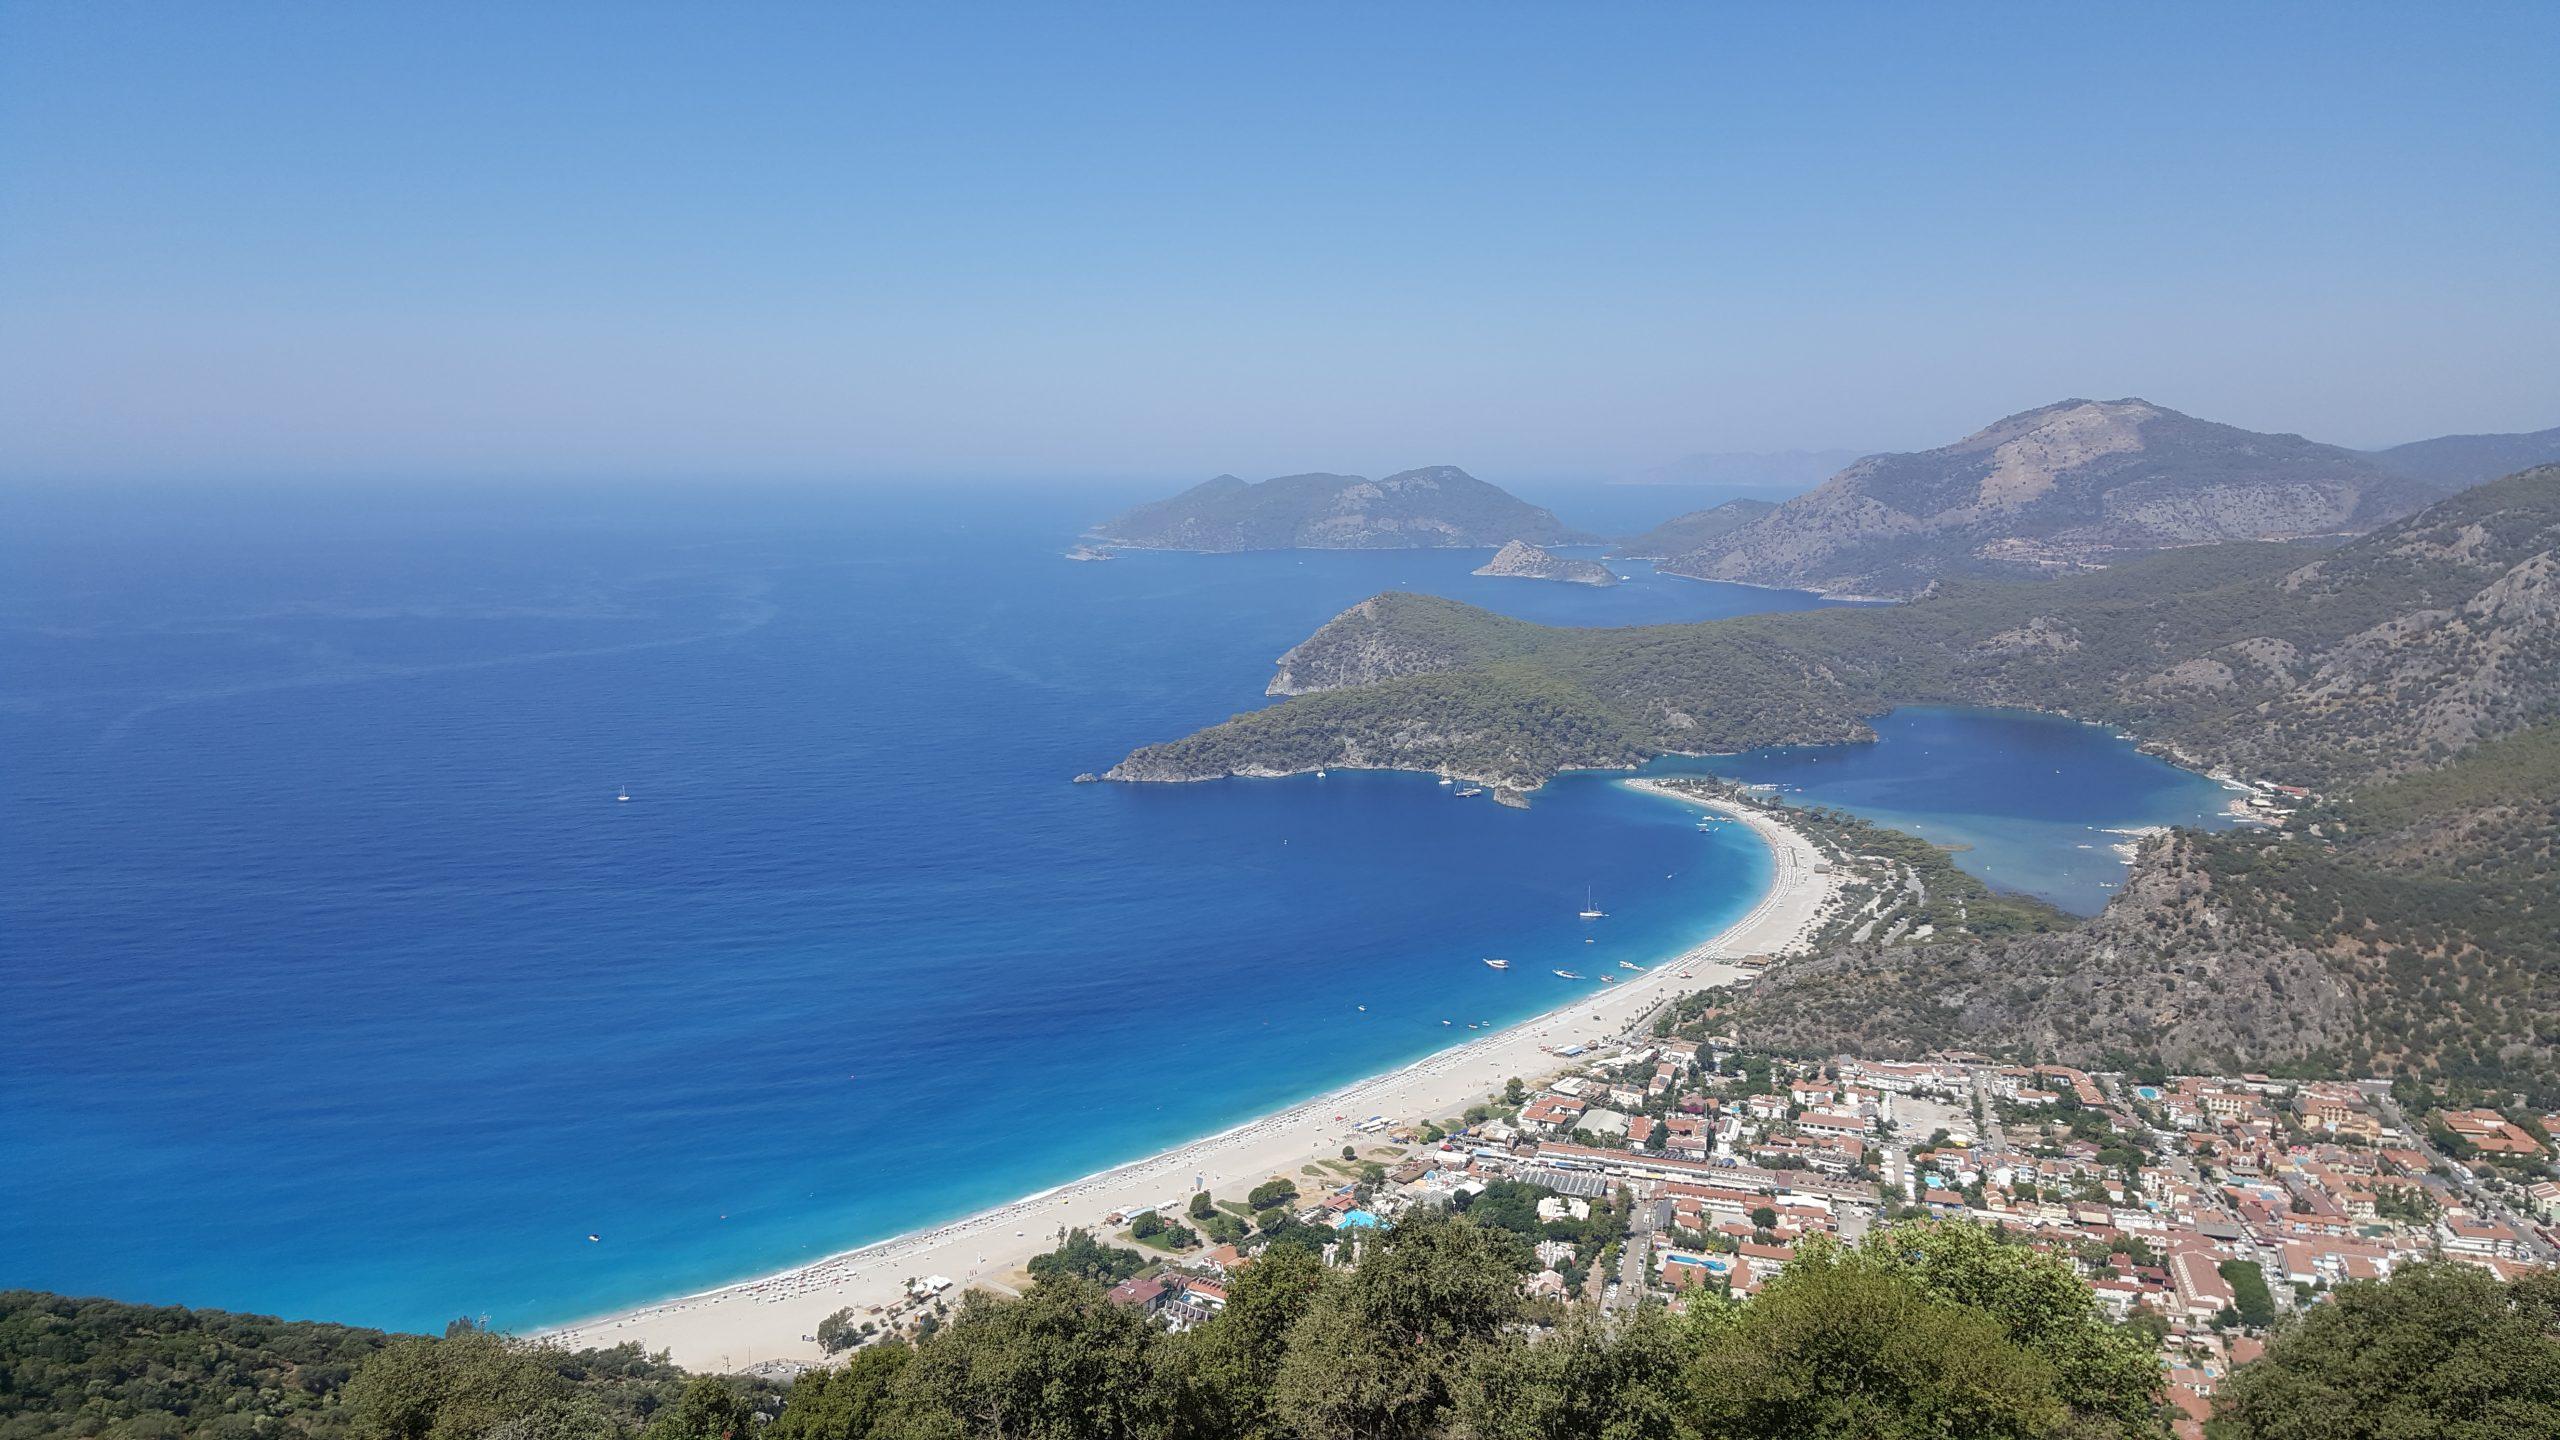 What It's Like To Travel To Turkey During The Coronavirus Pandemic